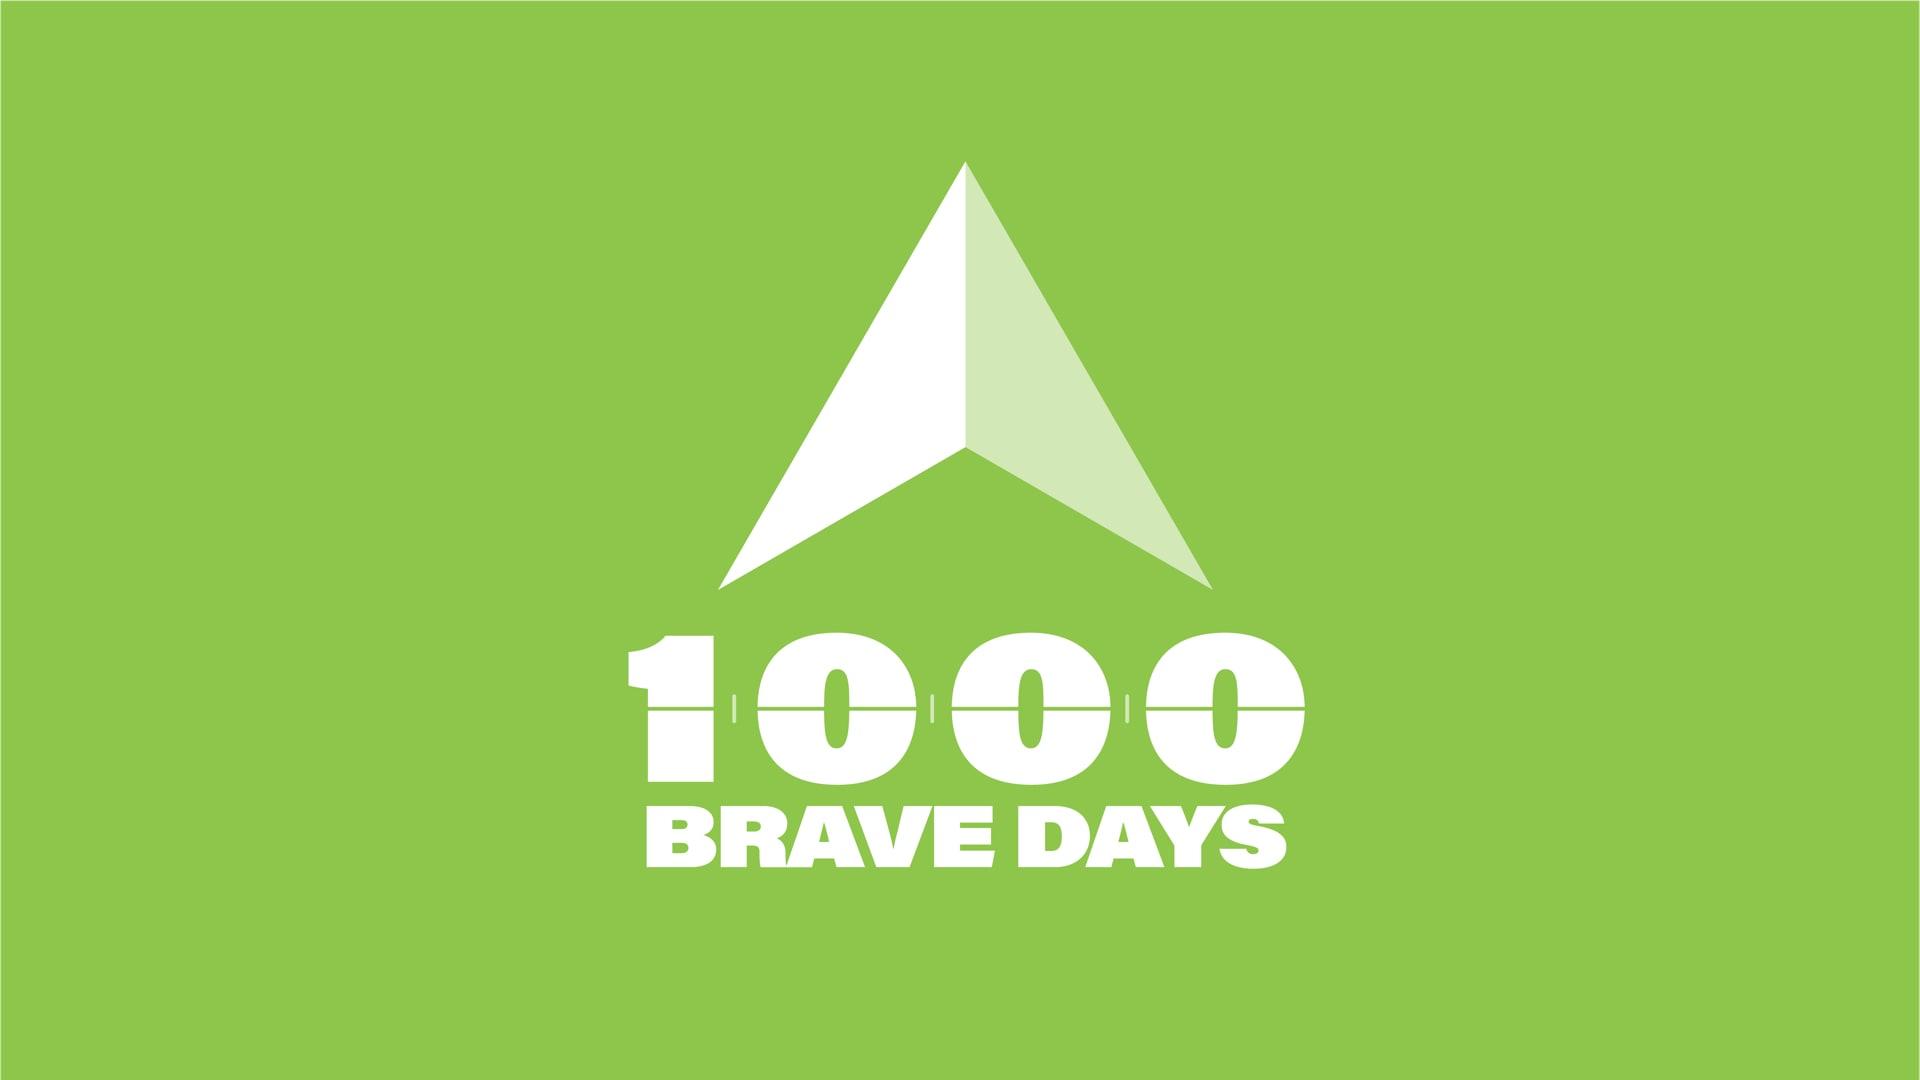 1000 Brave Days